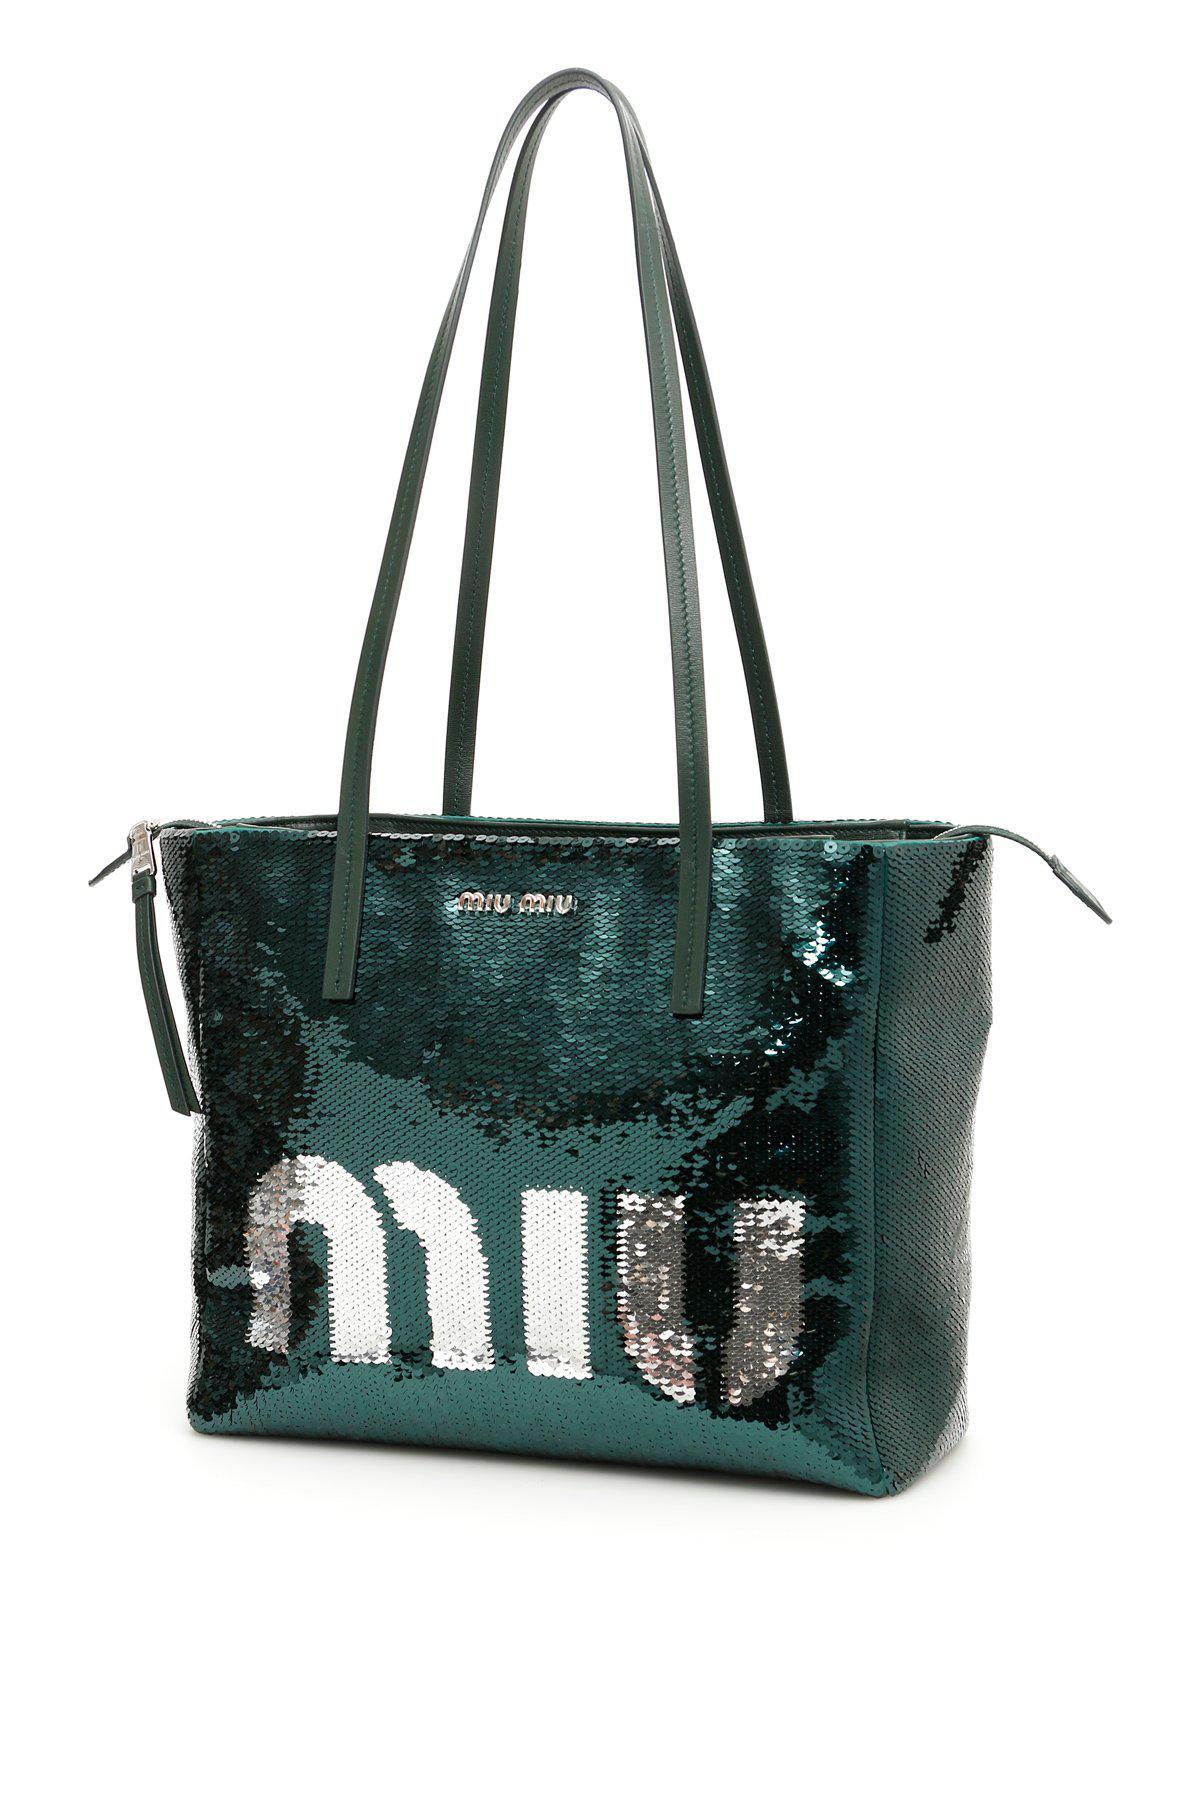 Miu Miu Crossbody Bags Women in Green - Save 18.712871287128706% - Lyst 360f502fa0b1f